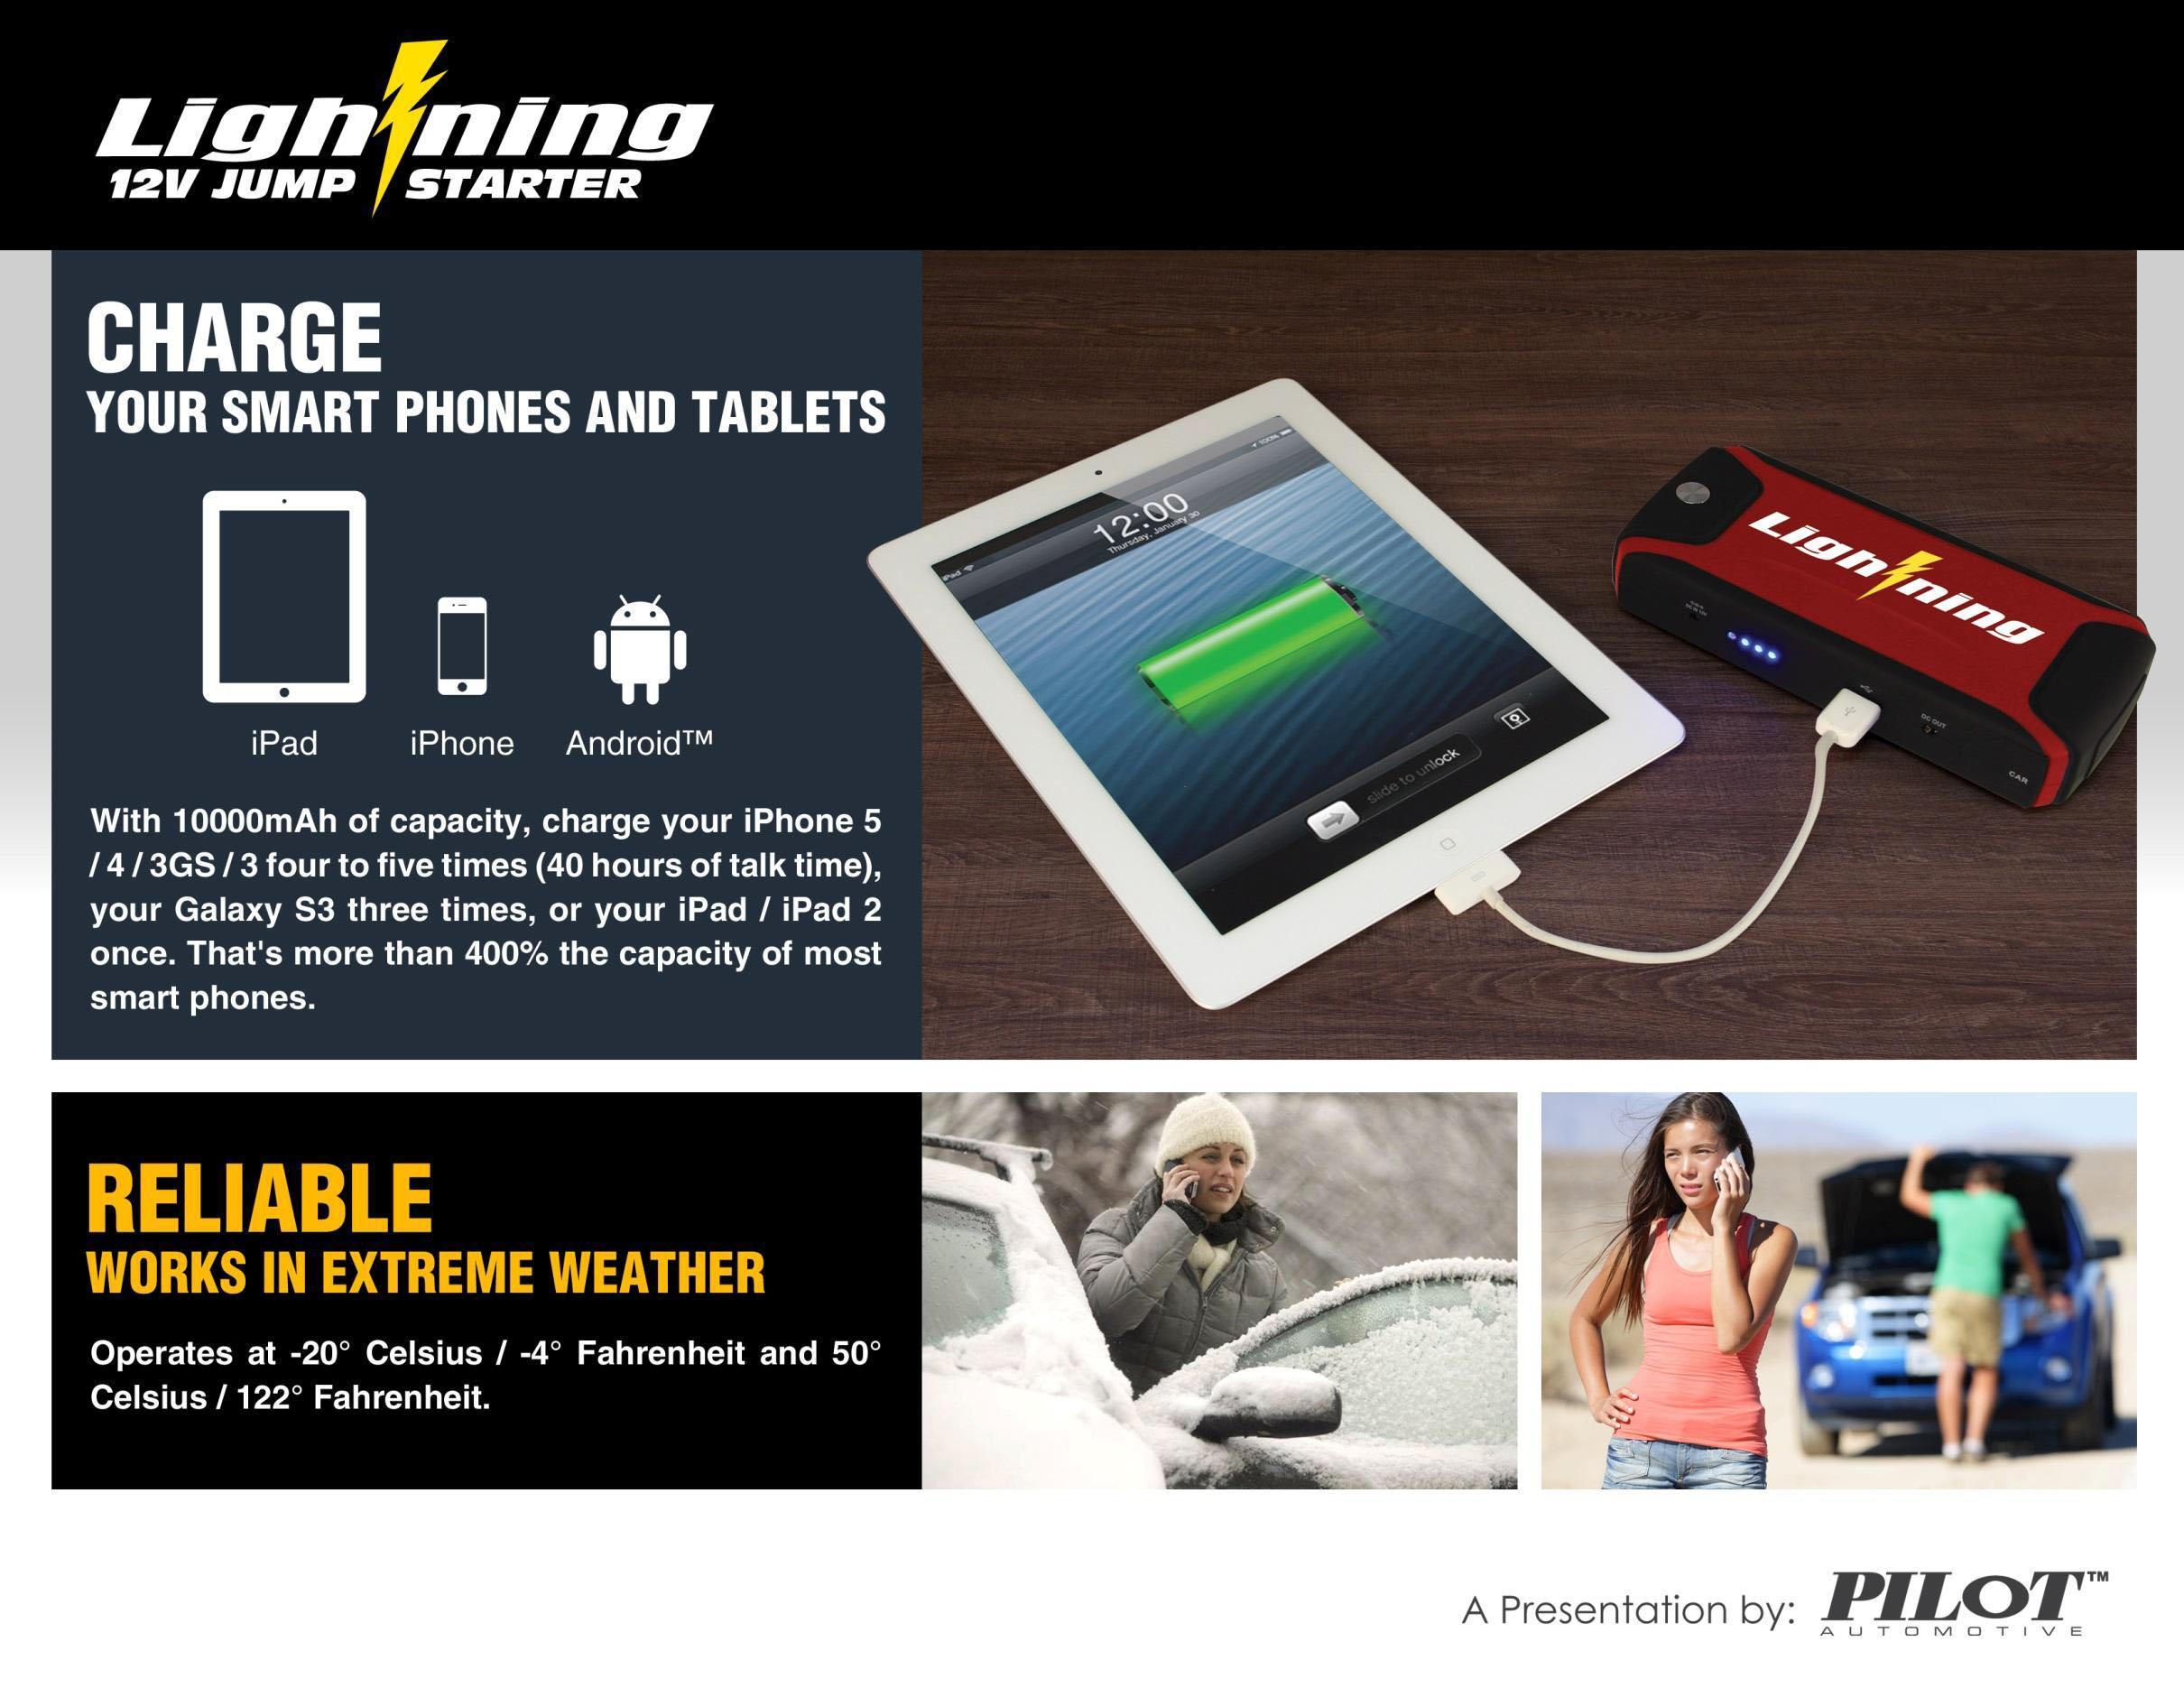 Lightning Start WPX20L-LS Power Source Sealed 500cca 20ah ...  |Power Source Jump Starter Lightning